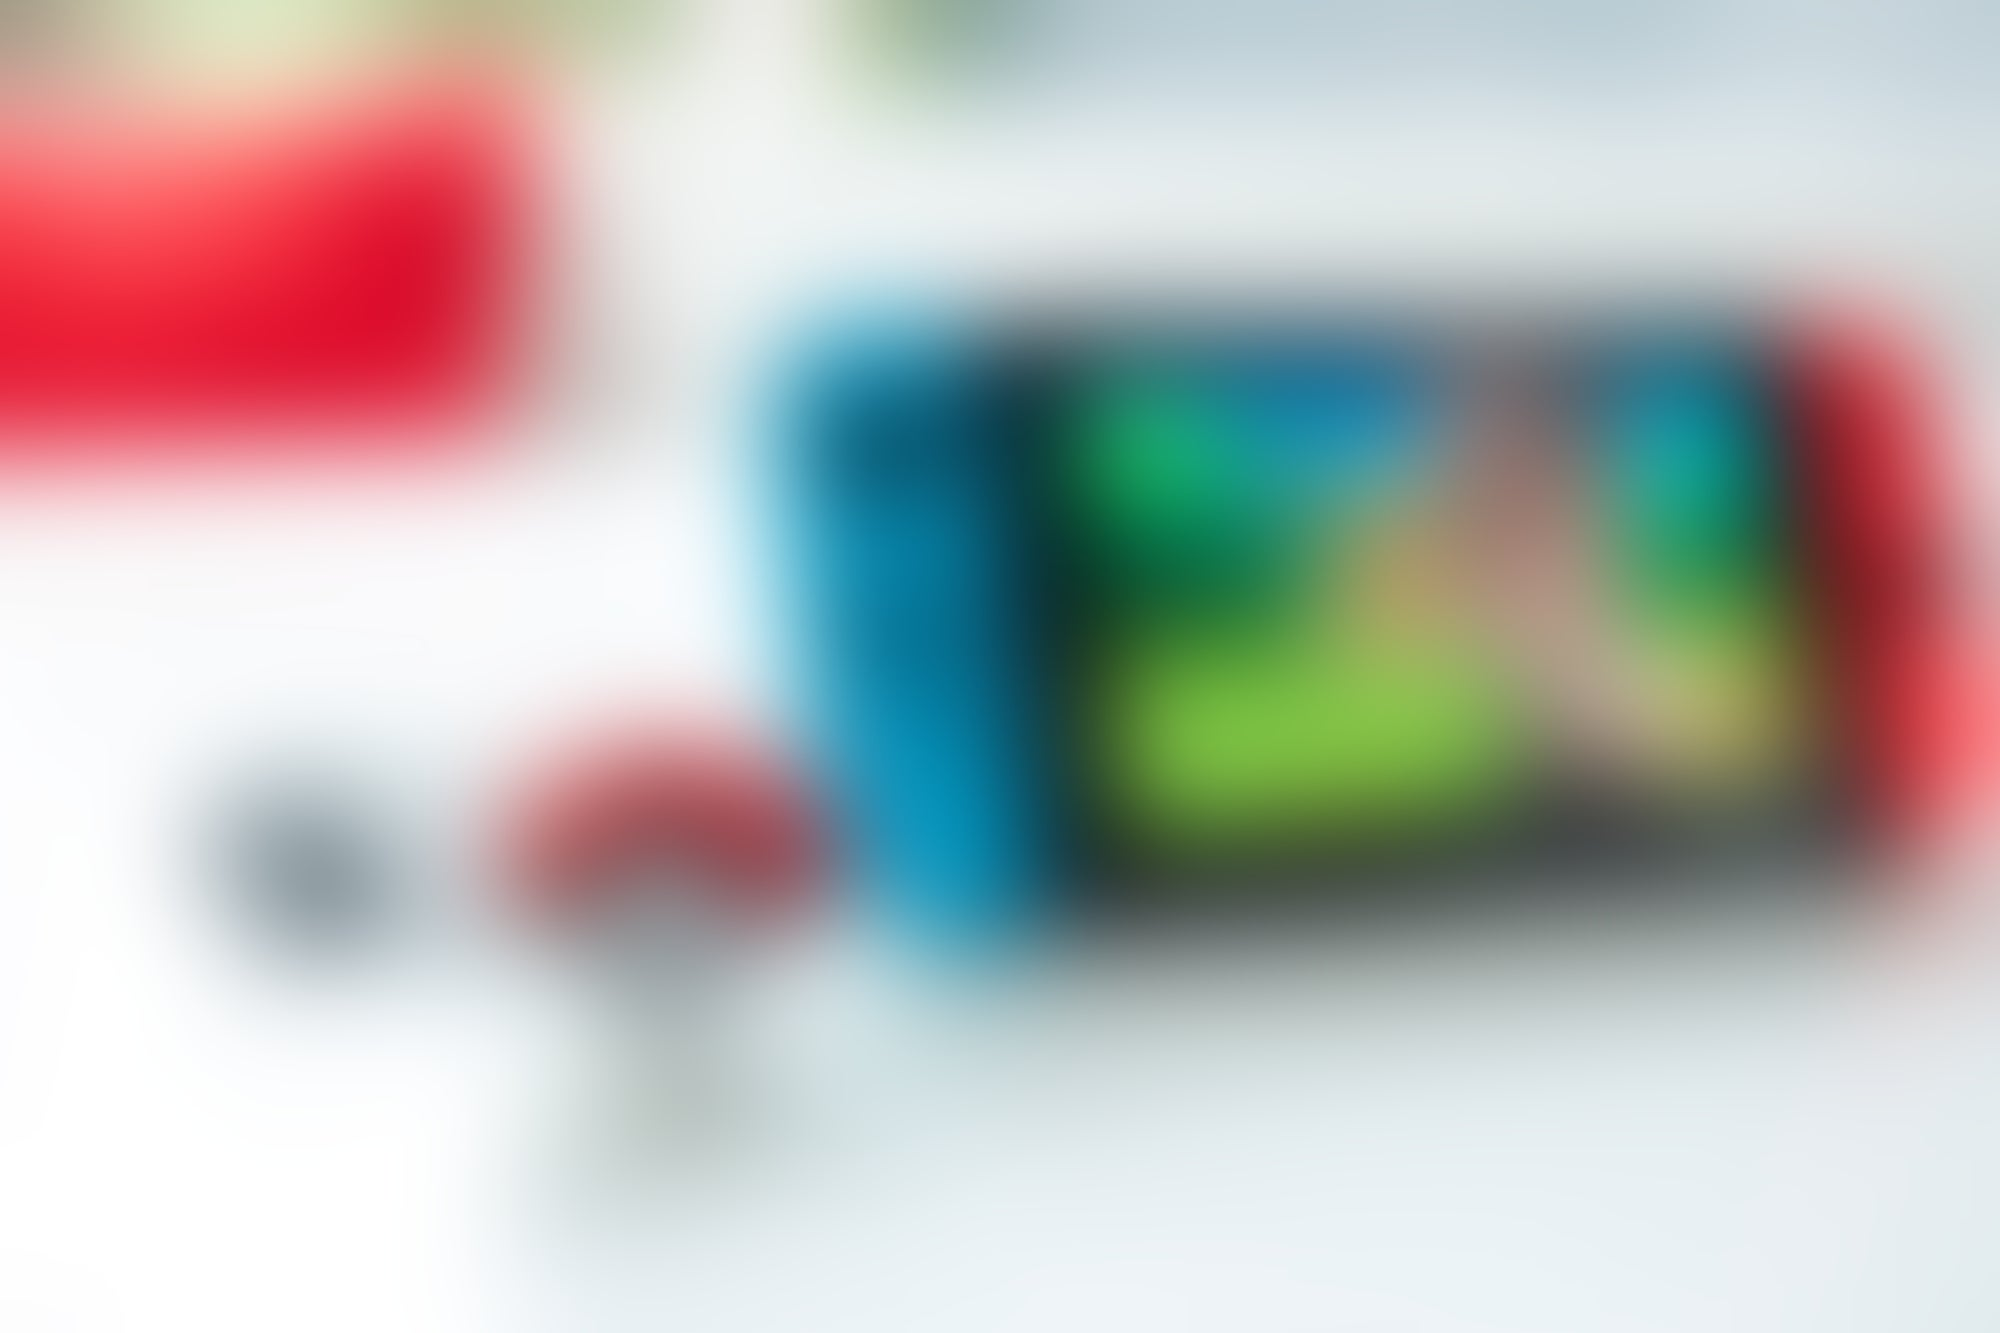 Upcoming Pokémon Game on Nintendo Switch Hopes to Capture Huge Mobile Fan Base of 'Pokémon Go'